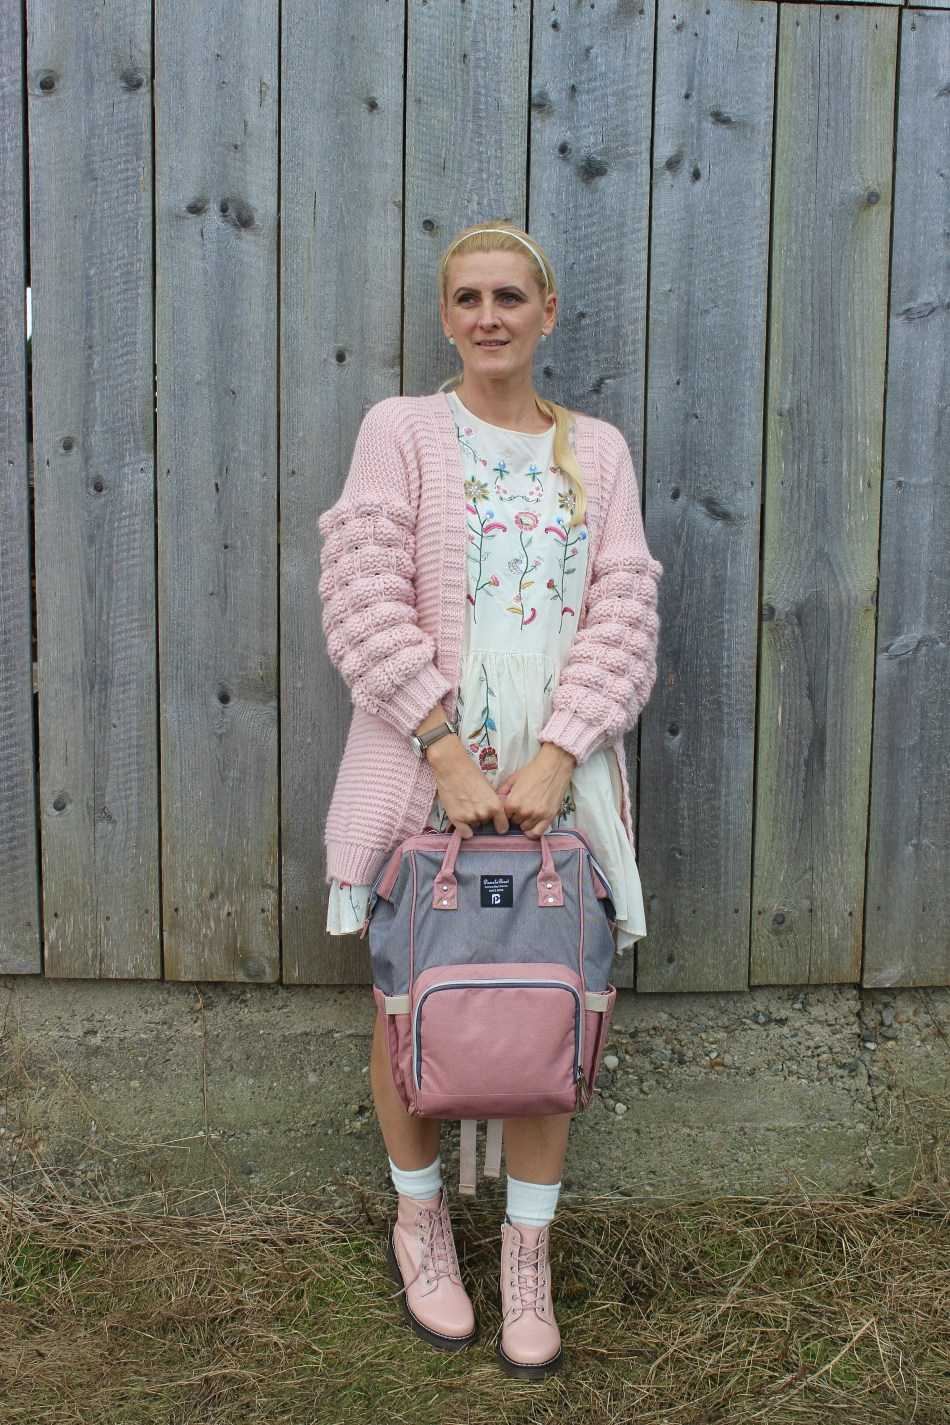 Zaradress-Cardigan-Pink-Boots-Fashionsocks-Wickelrucksack-Baby-Mamablog-carrieslifestyle-Tamara-Prutsch